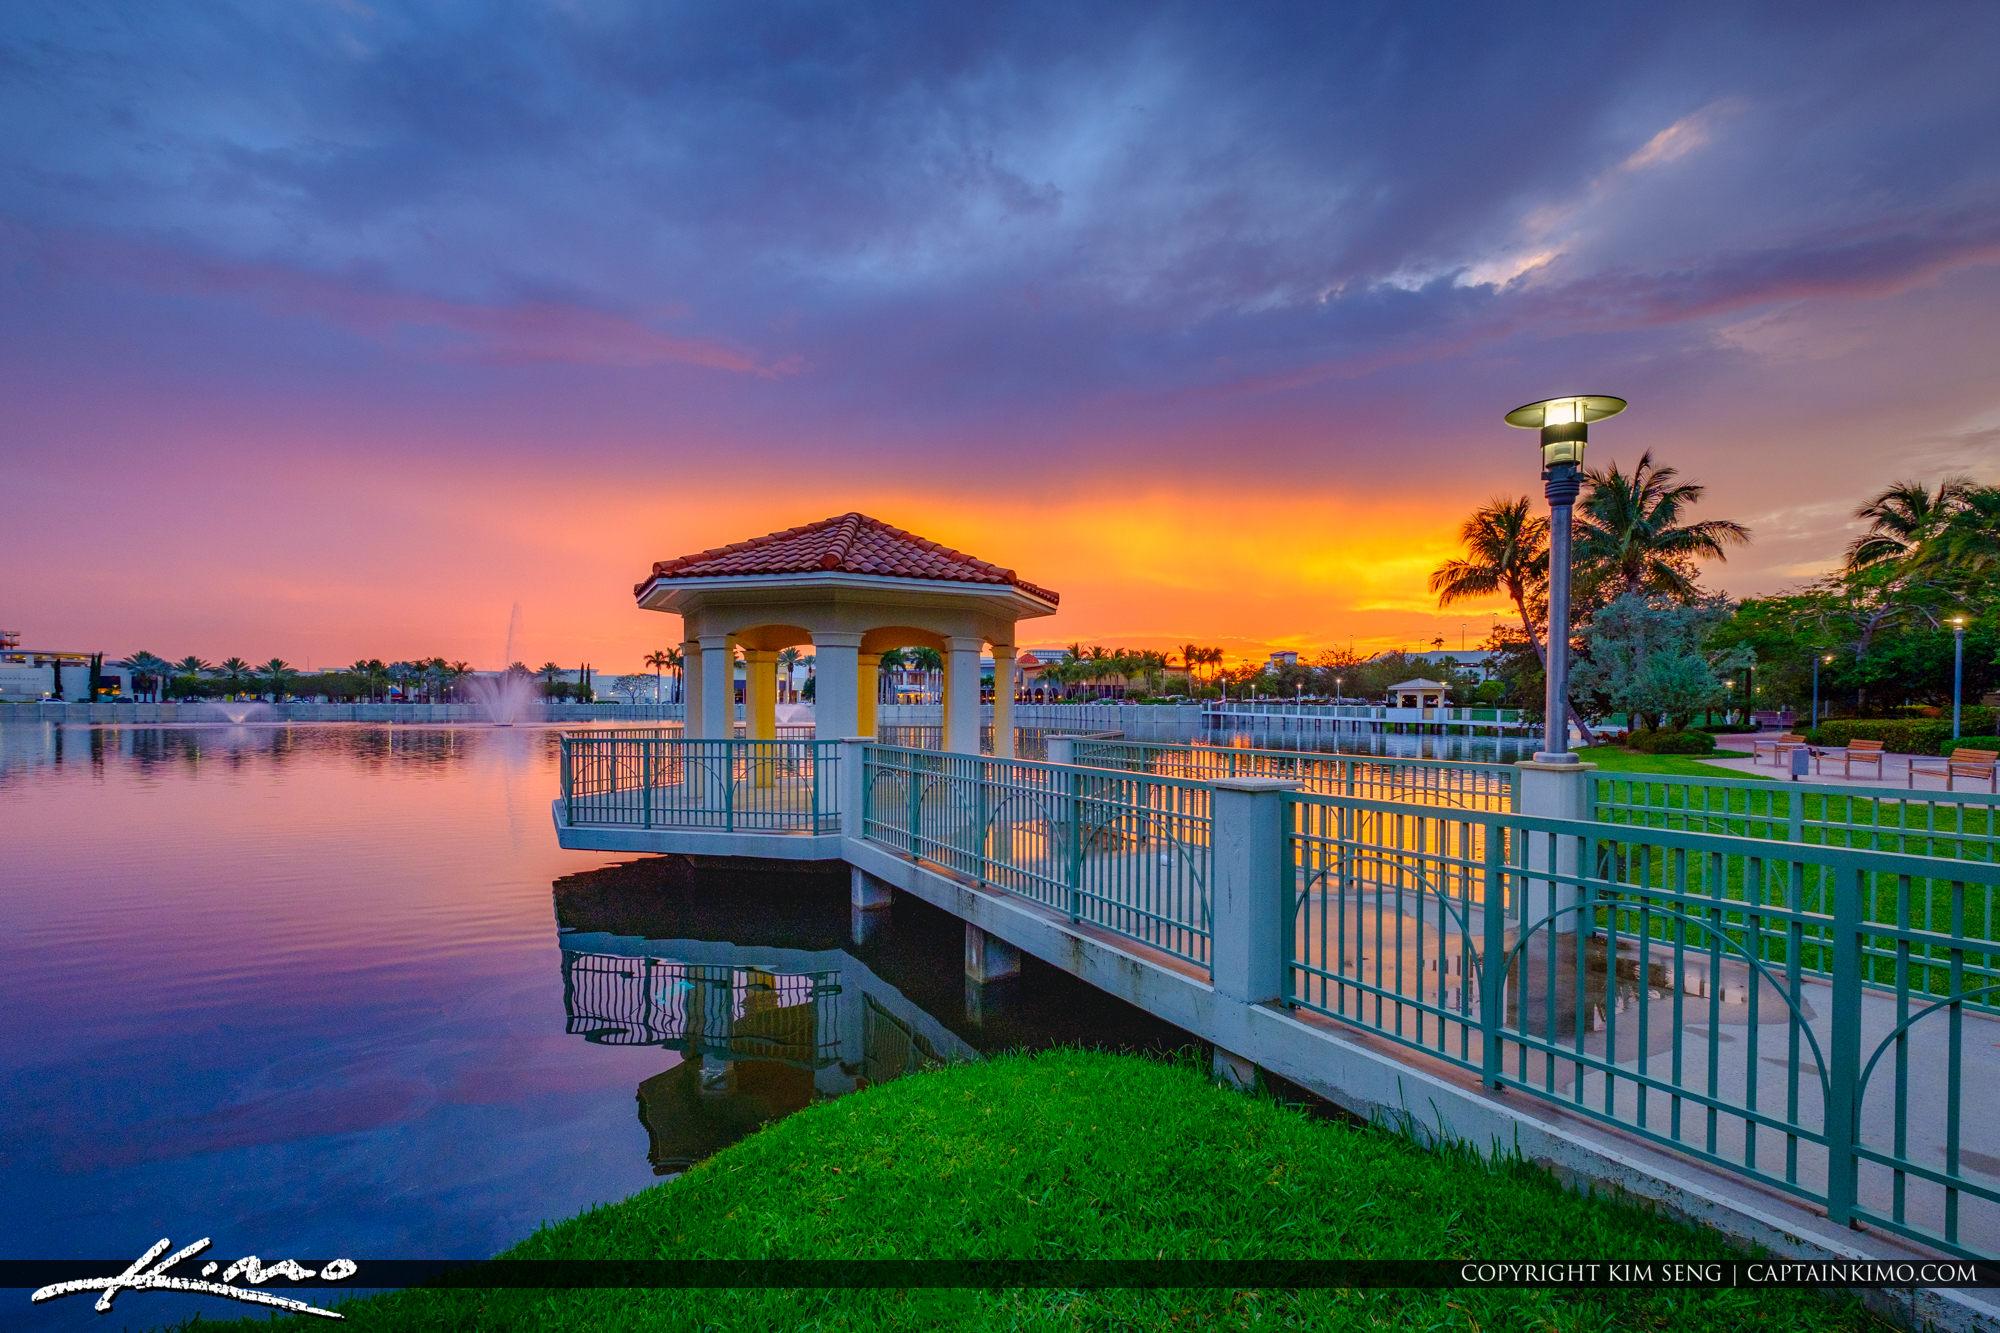 Gazebo Sunset at Lake Downtown at the Gardens